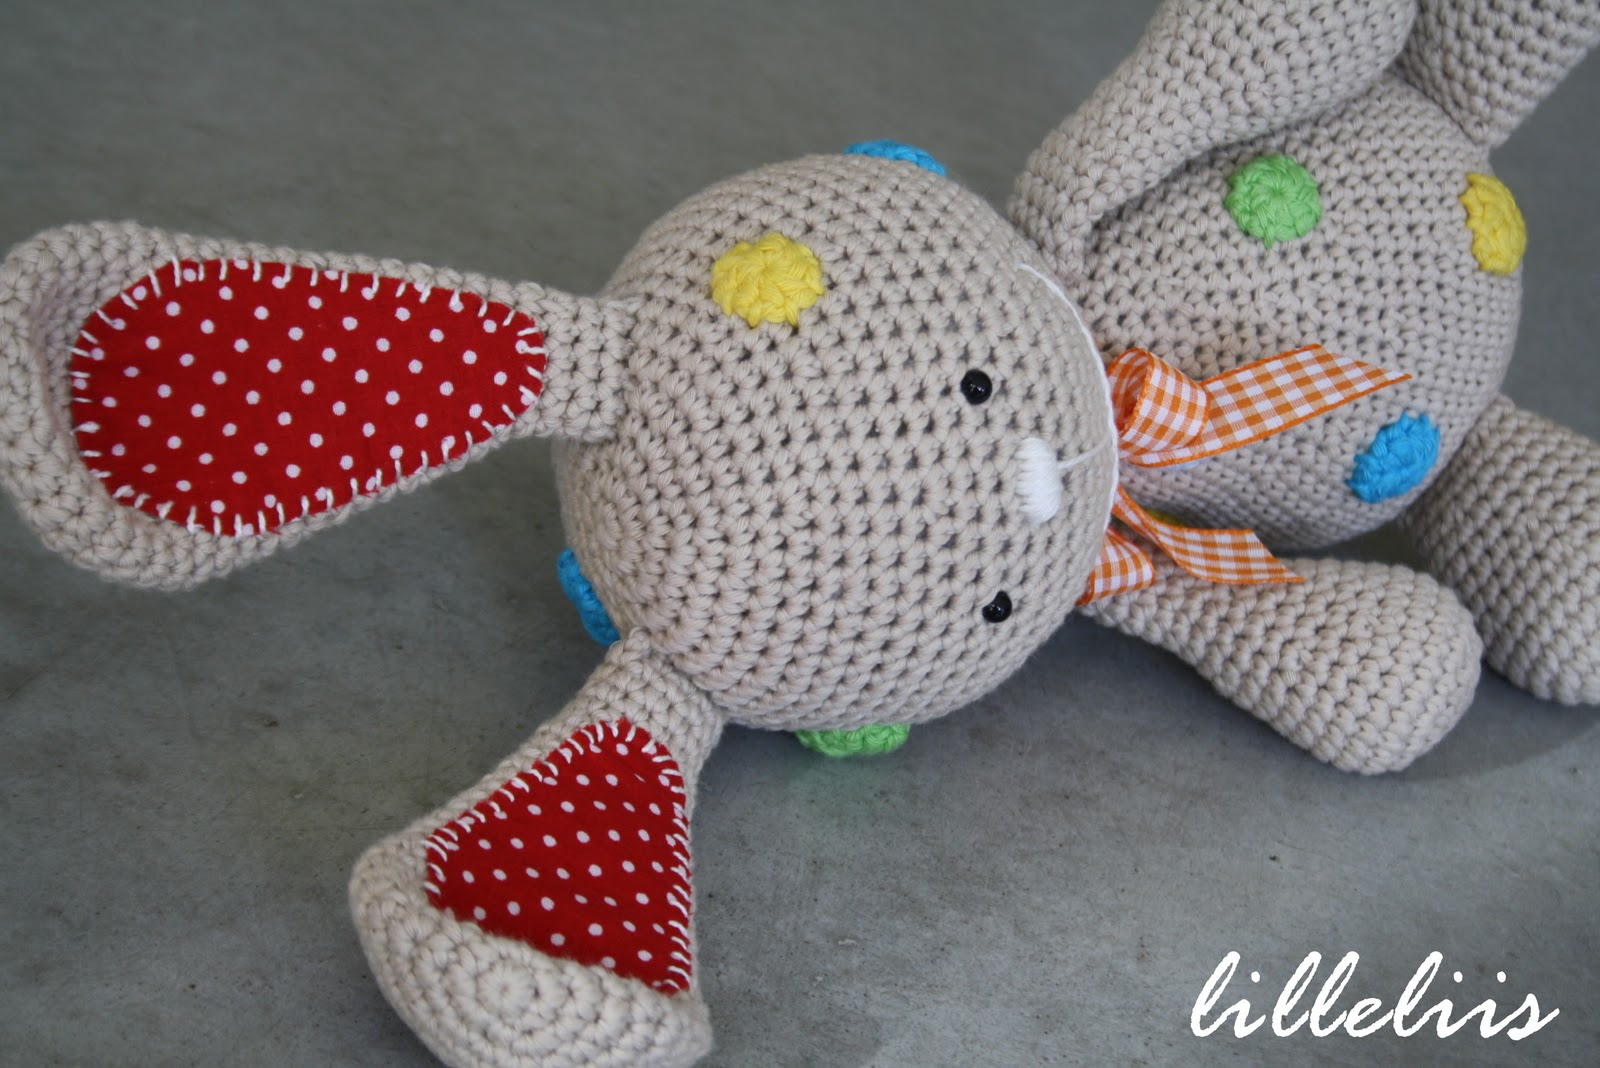 Amigurumi Janes : lilleliis.blogspot.com: Kommi-janes Lalla